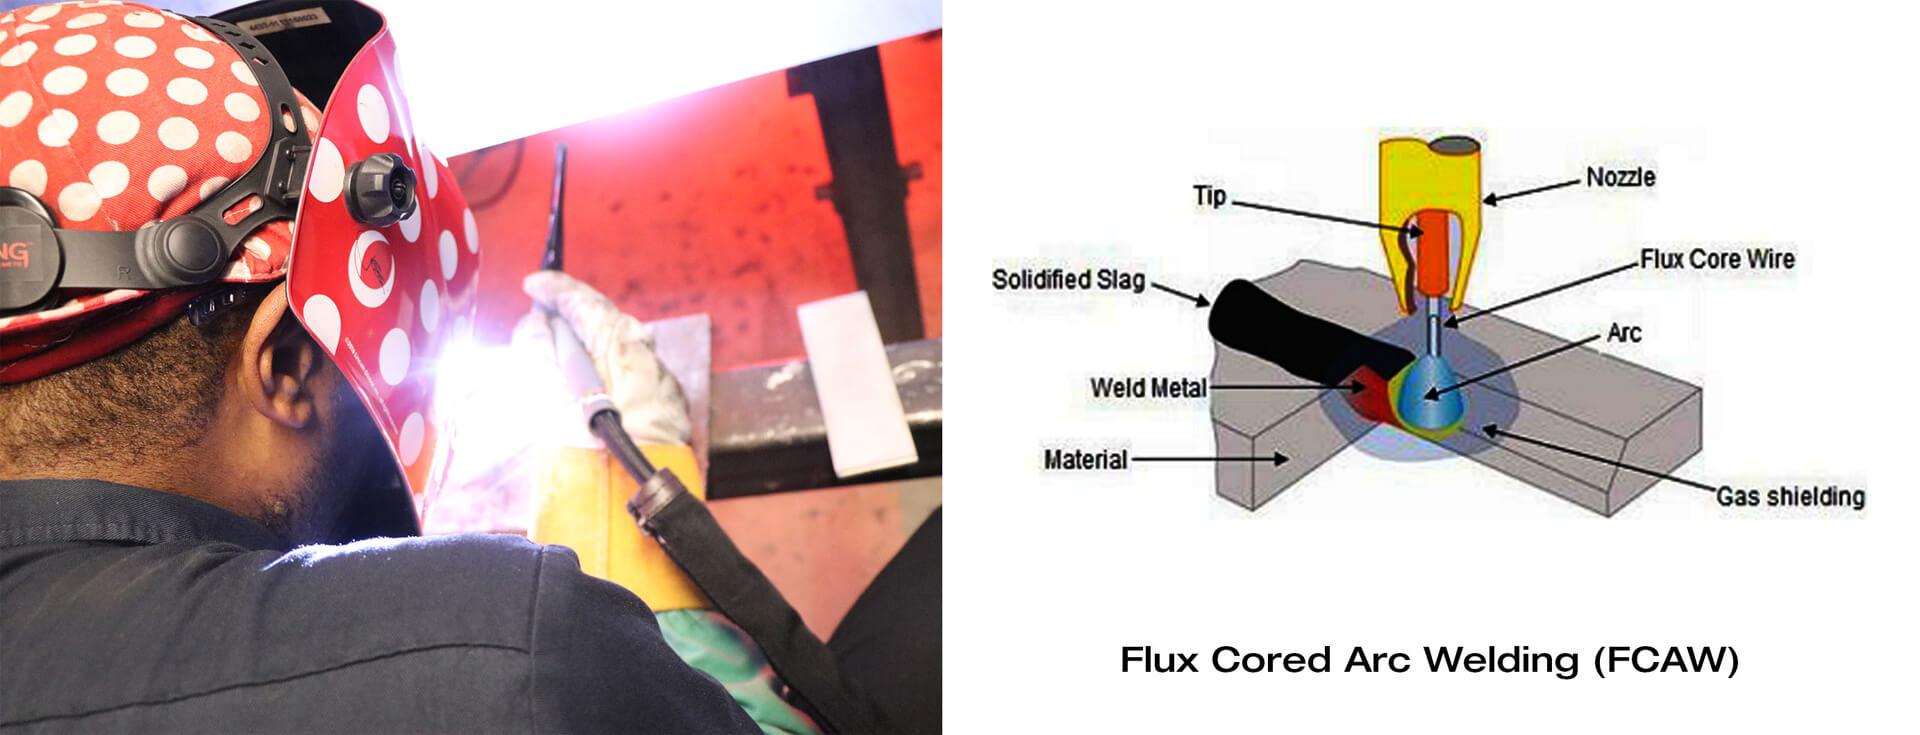 Type of Welding technology - Flux Cored Arc welding